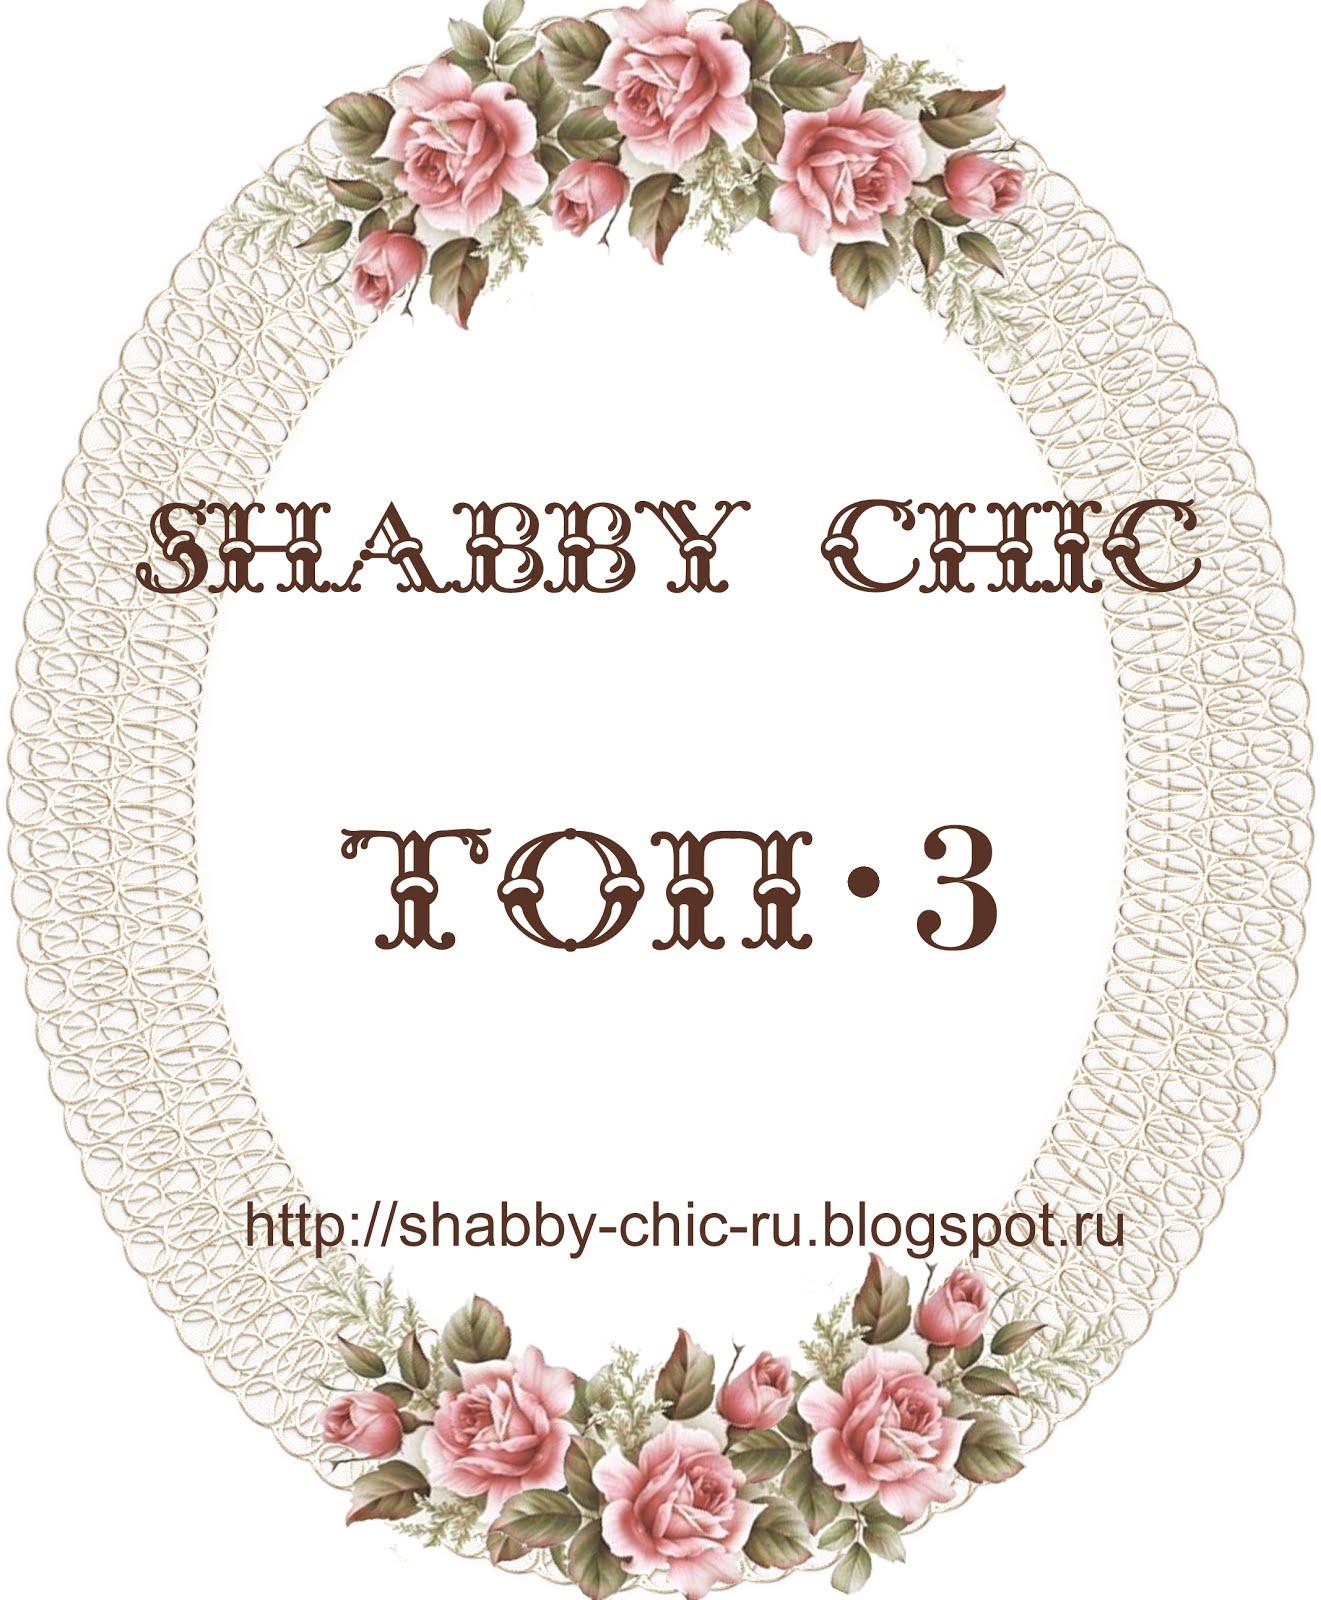 ТОП-3 в блоге SHABBY CHIC